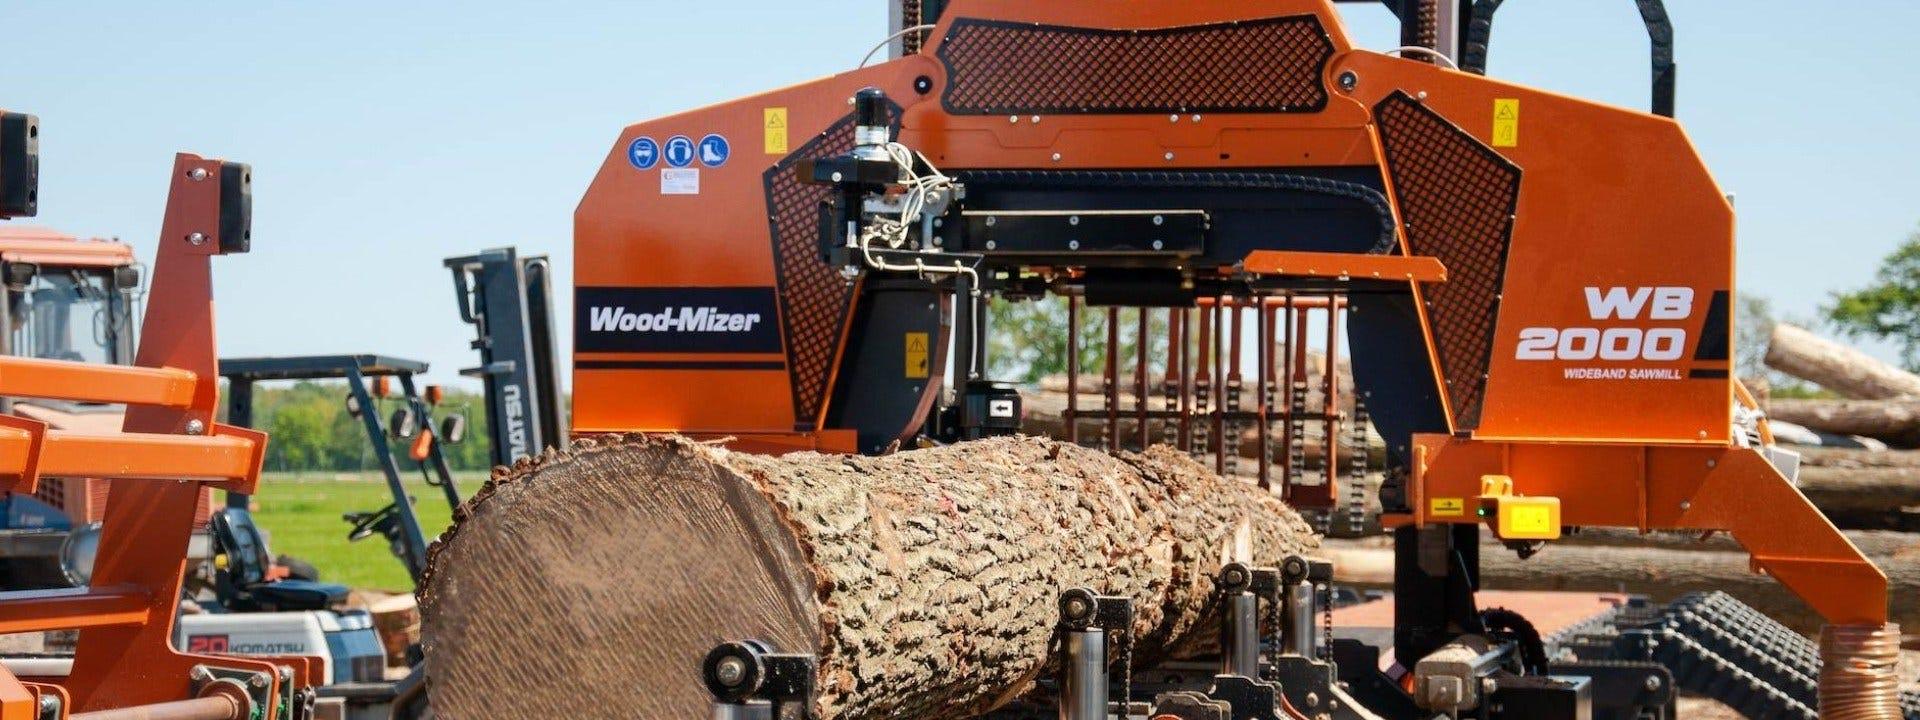 WB2000 High-Performance Industrial Sawmill